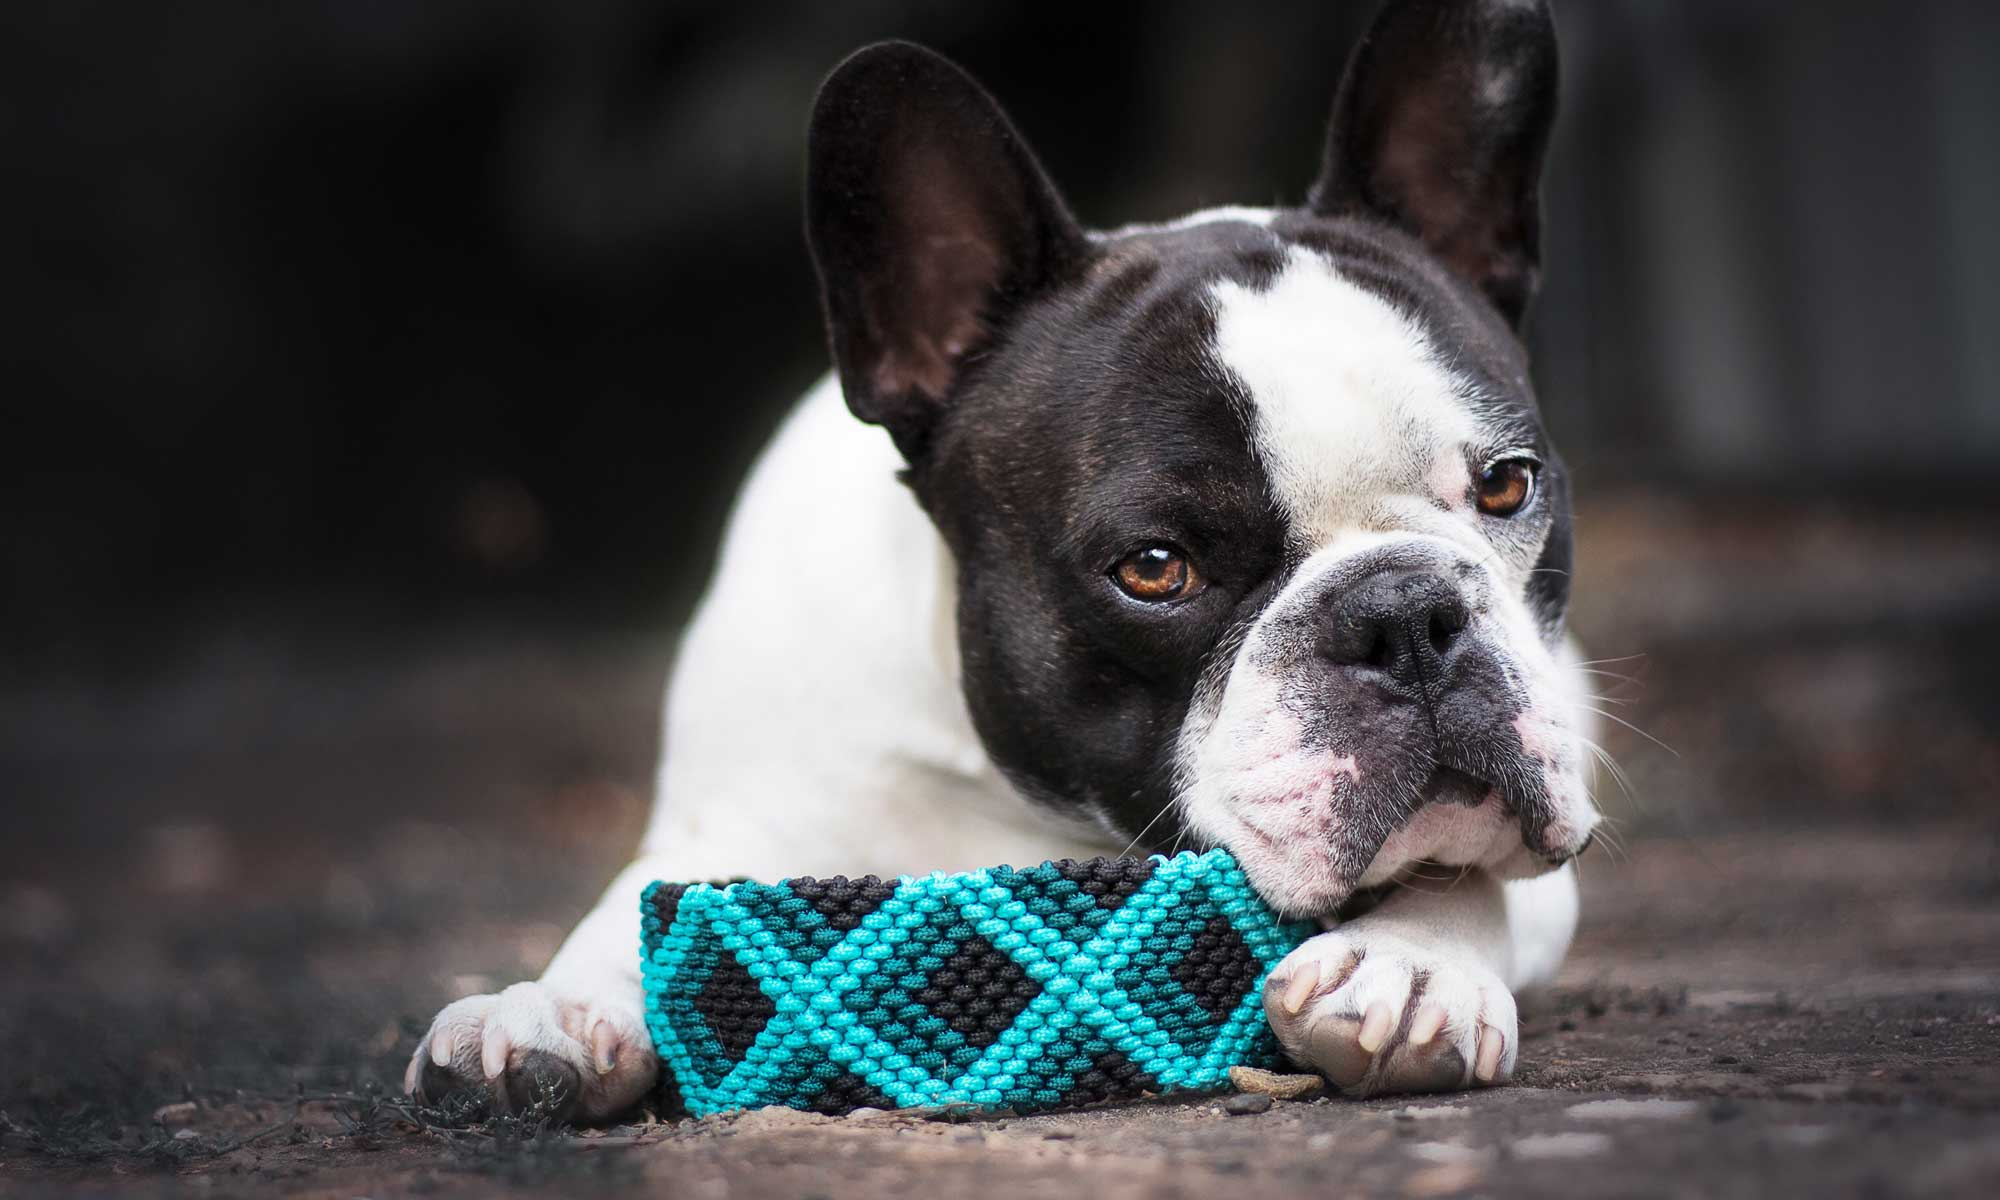 Maßgeschneiderte Hundehalsbänder